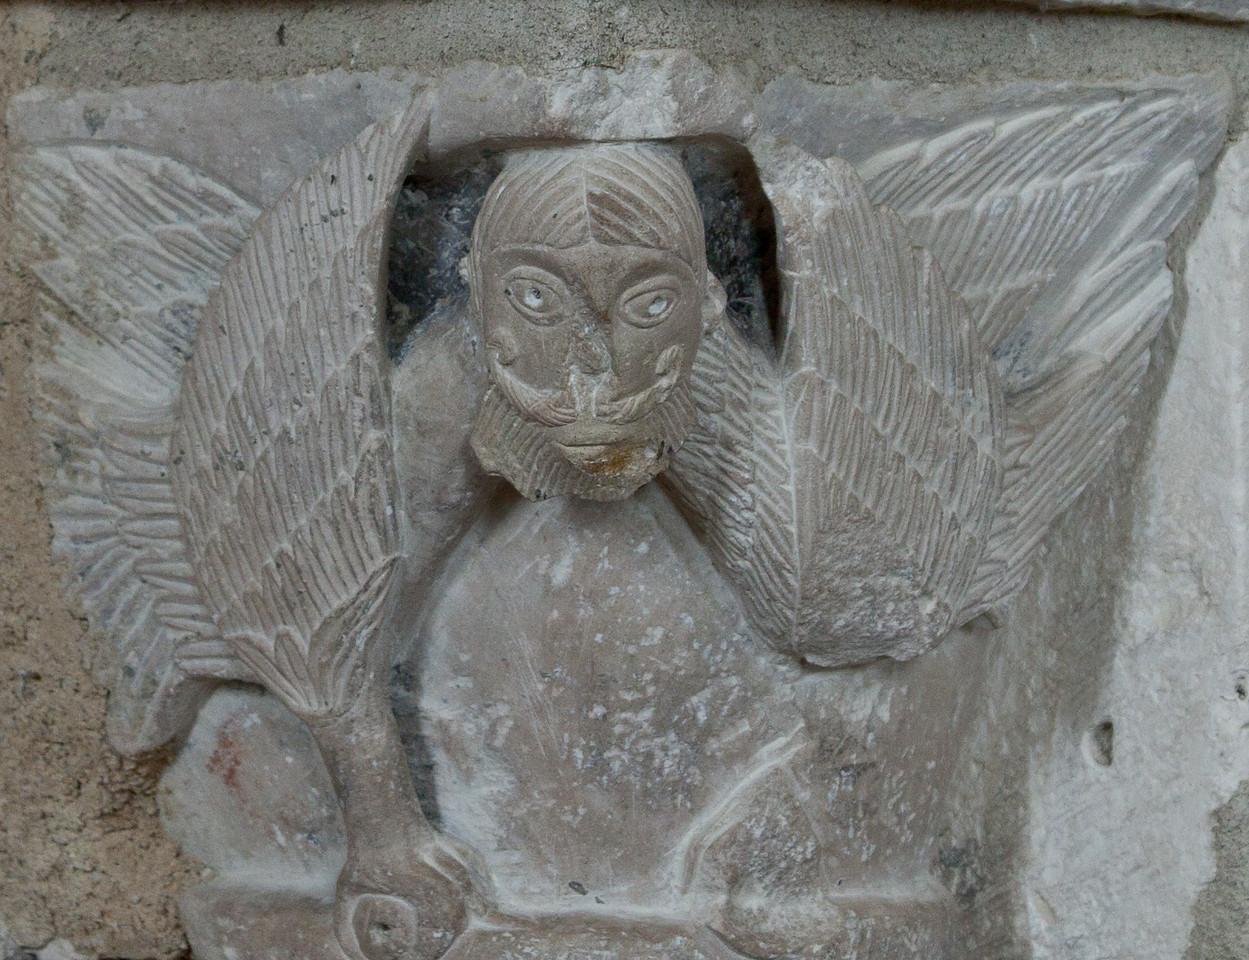 Plaimpied, Saint-Martin Abbey Capital Bearded Man